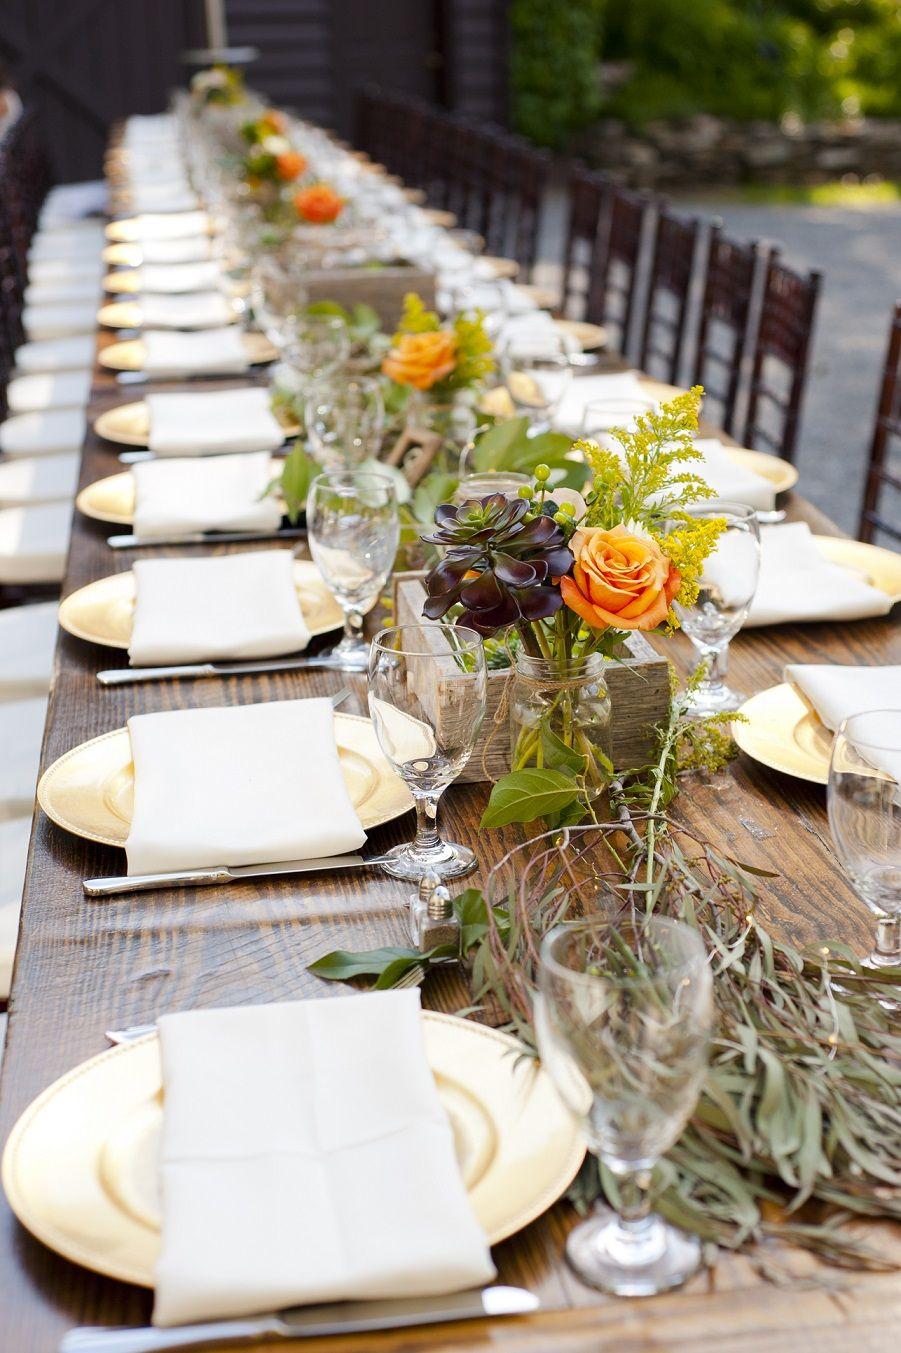 long table setup wedding reception%0A Elegant and bright  tablesetting for a  wedding  reception  Table  SettingsWedding ReceptionReceptions